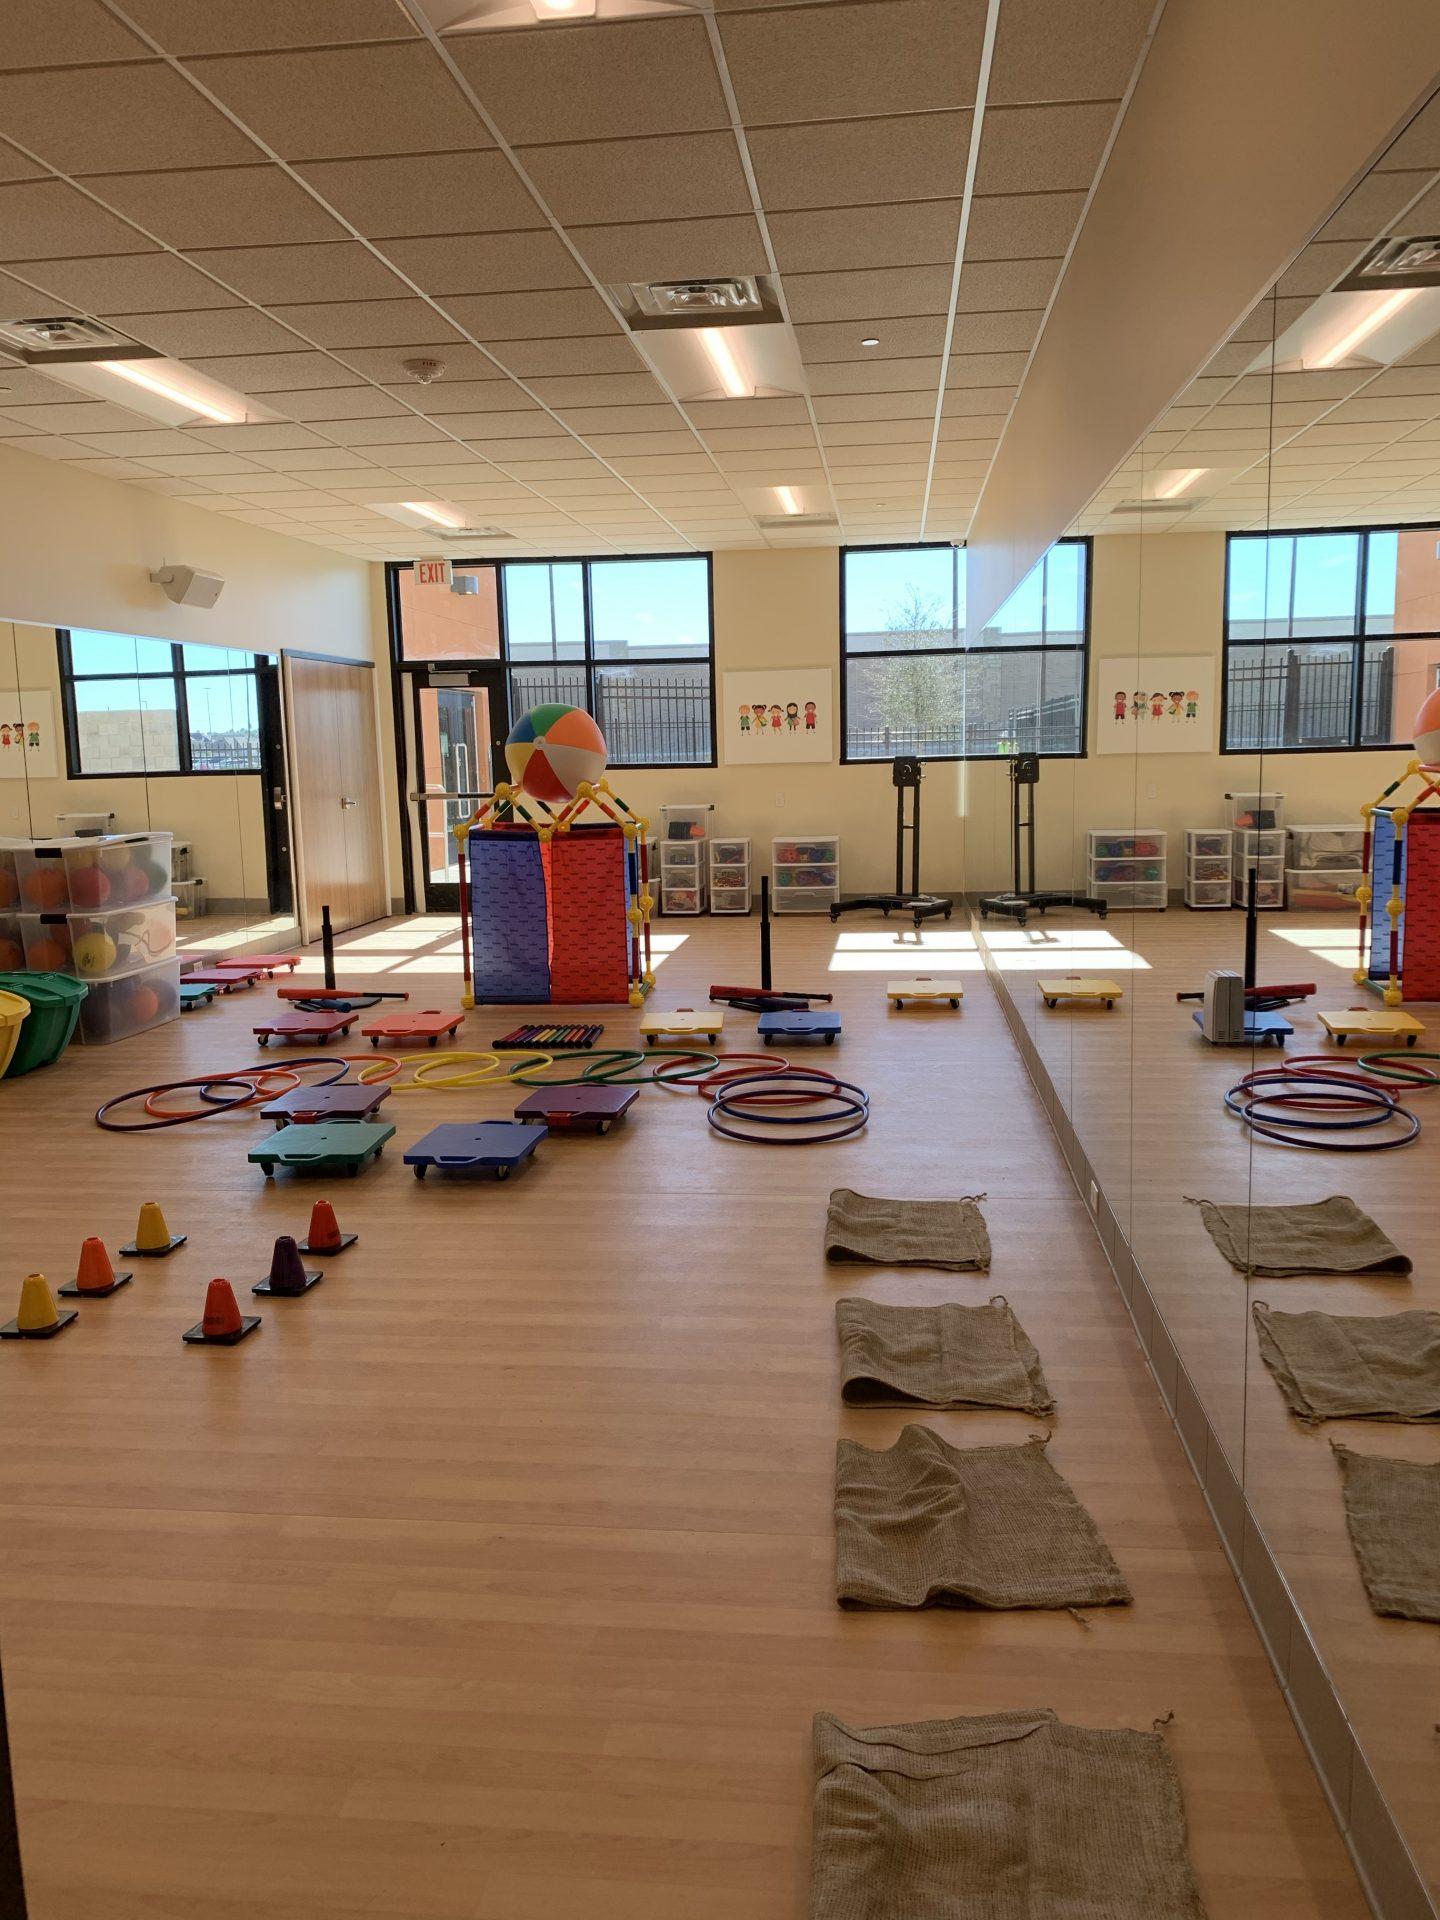 kids play room - gyms in katy tx - villa sport cinco ranch